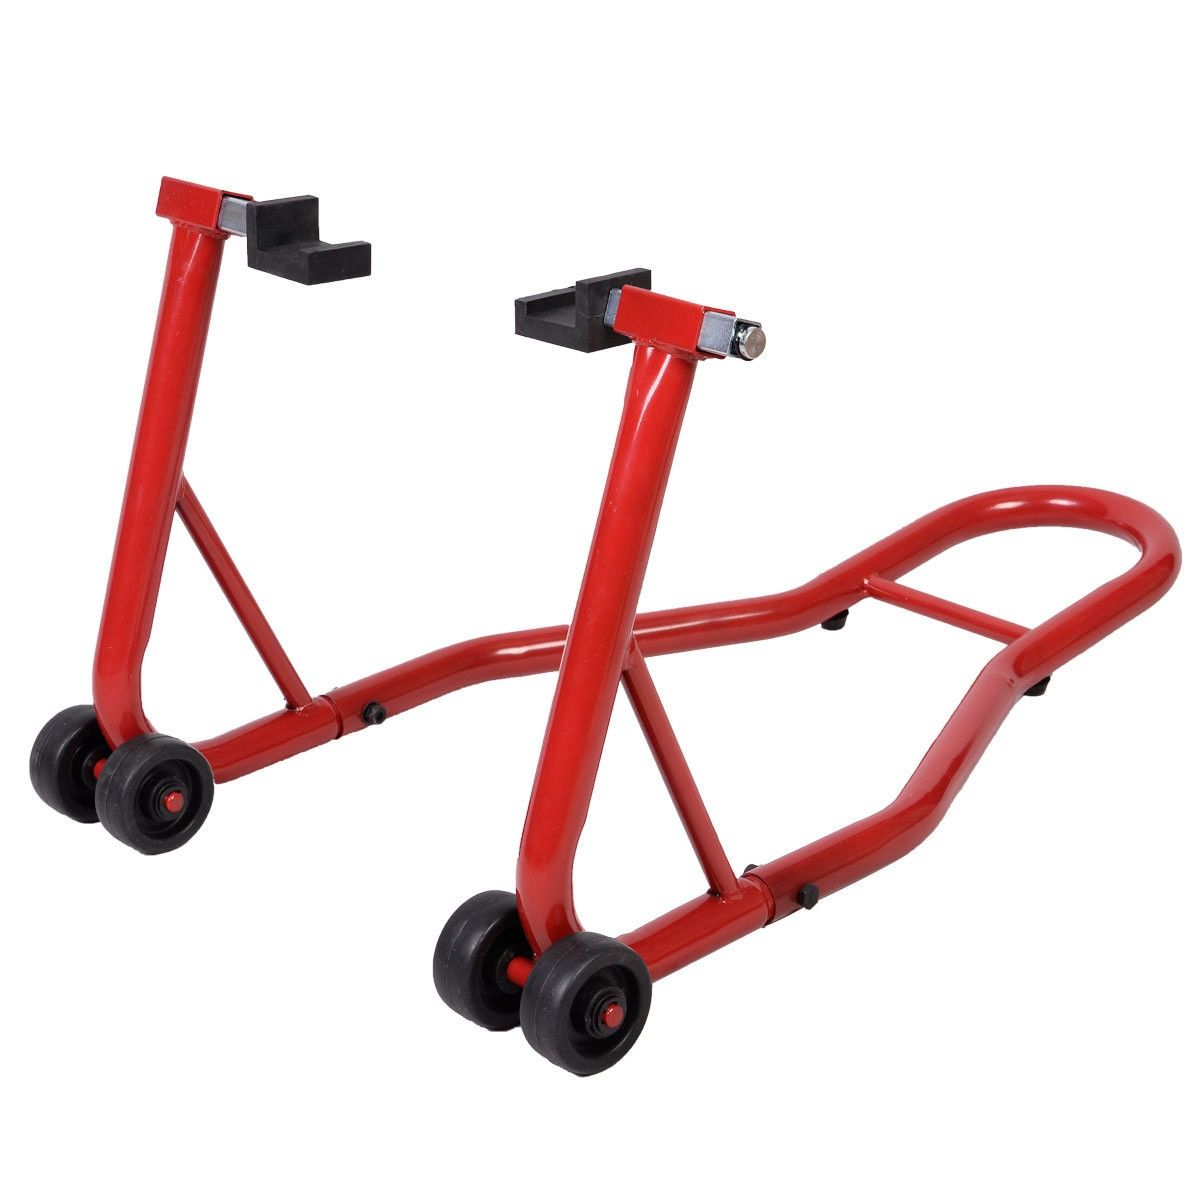 Forklift Paddock Swingarm Lift Motorcycle Bike Stand Bike Stand